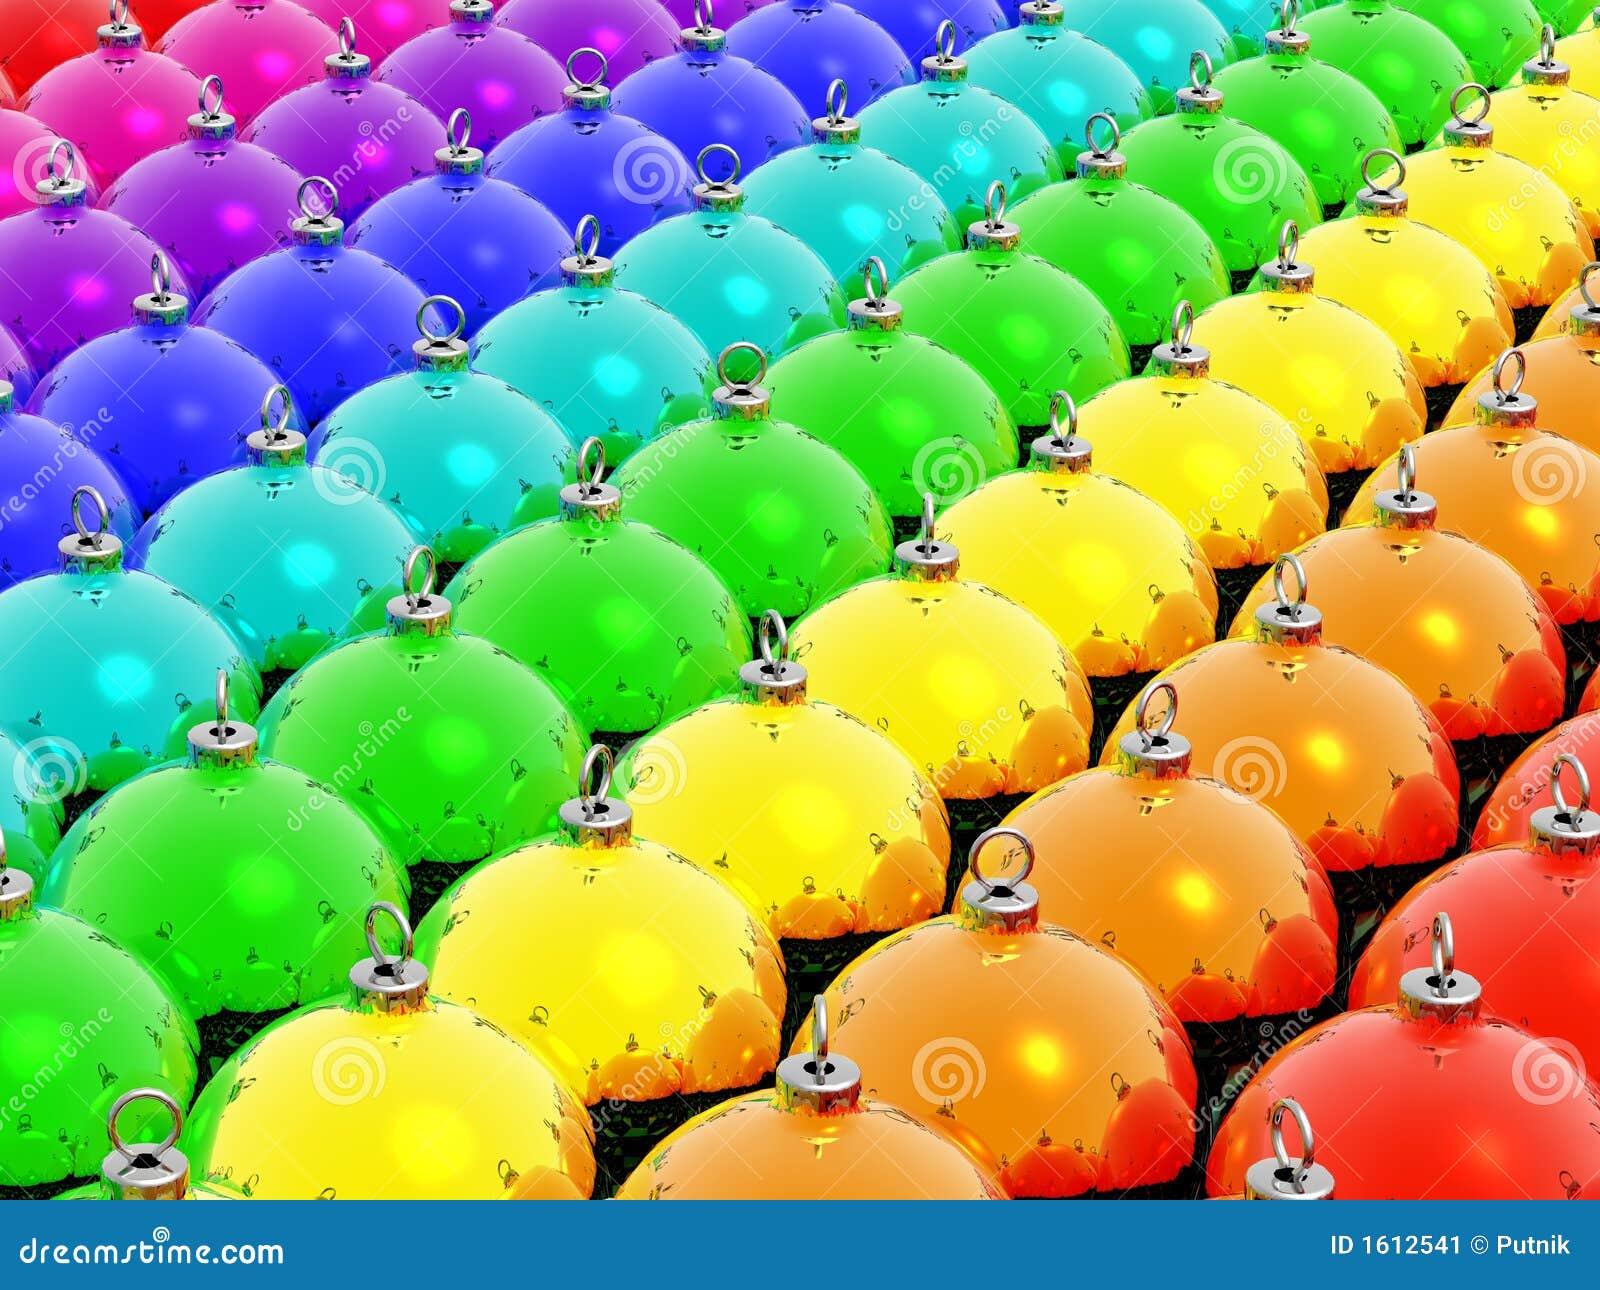 Rainbow Christmas Stock Image - Image: 1612541